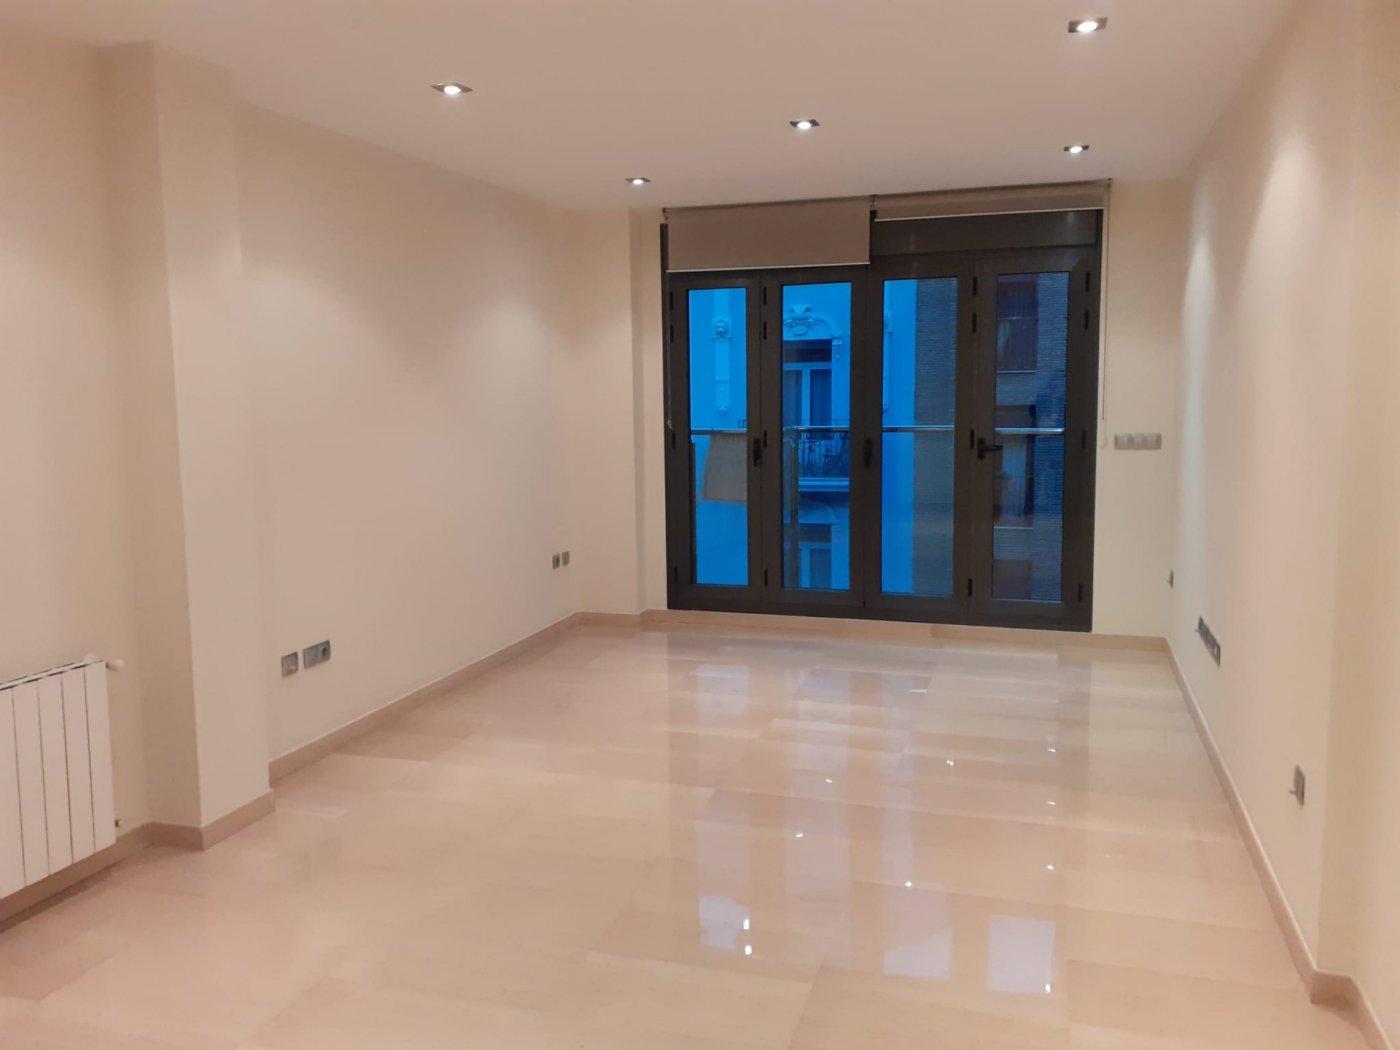 FantÁstico piso en alquiler calle ruzafa - imagenInmueble0